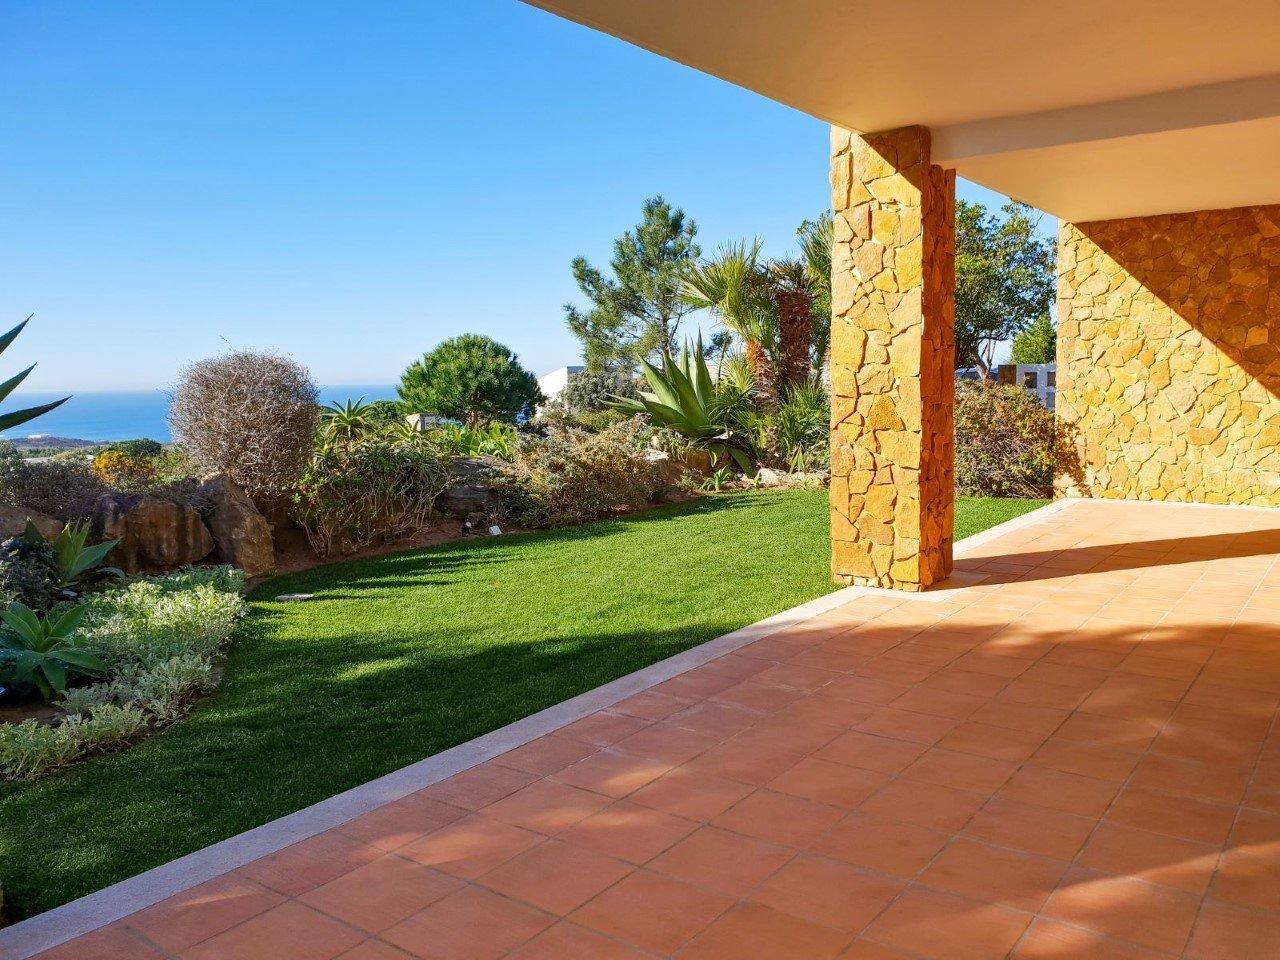 3 Bedroom Villa Cascais, Lisbon Ref: AMV12400